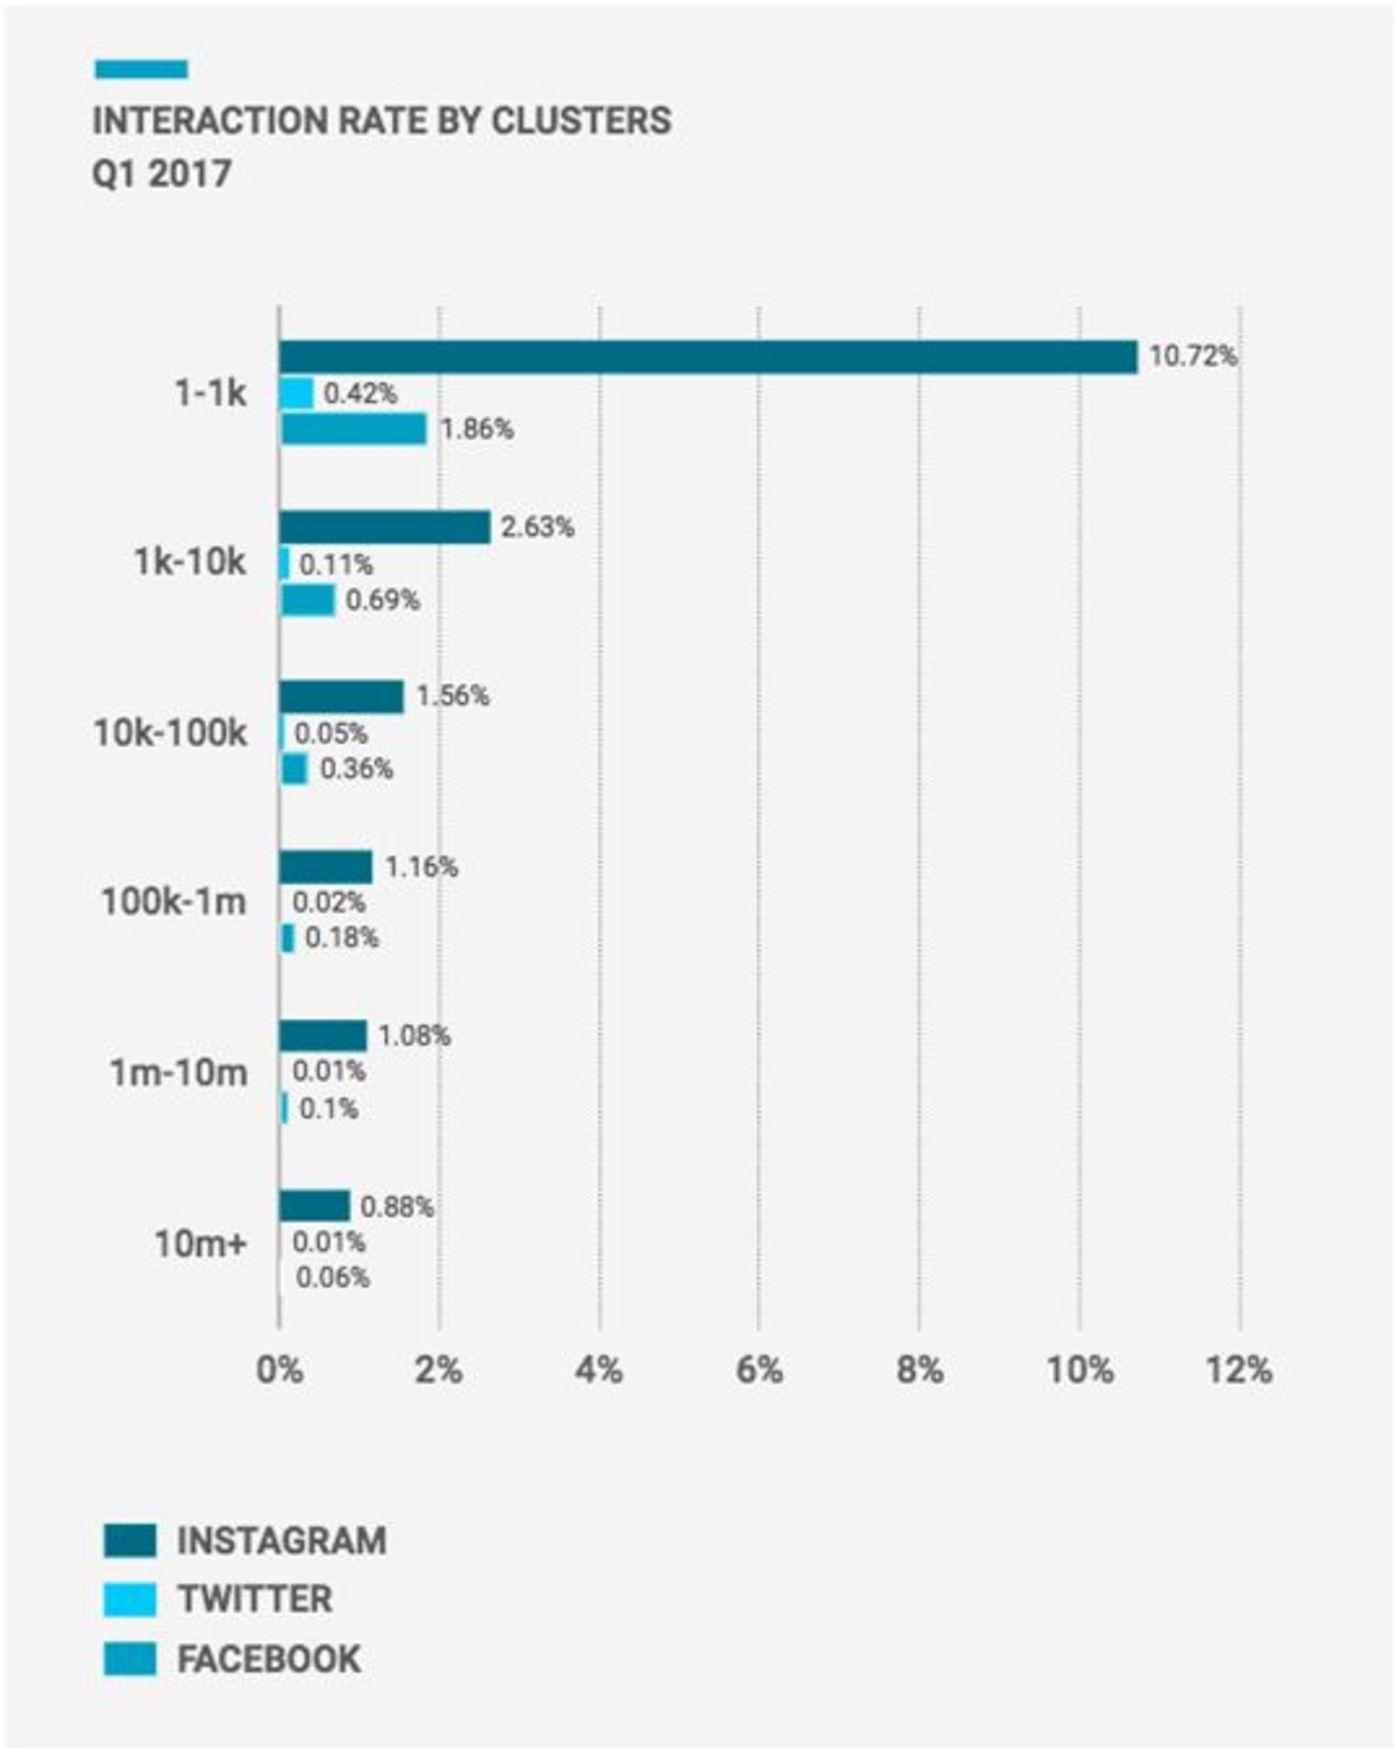 Instagram网红的粉丝黏度远远高于其他平台 | 来源:Quintly